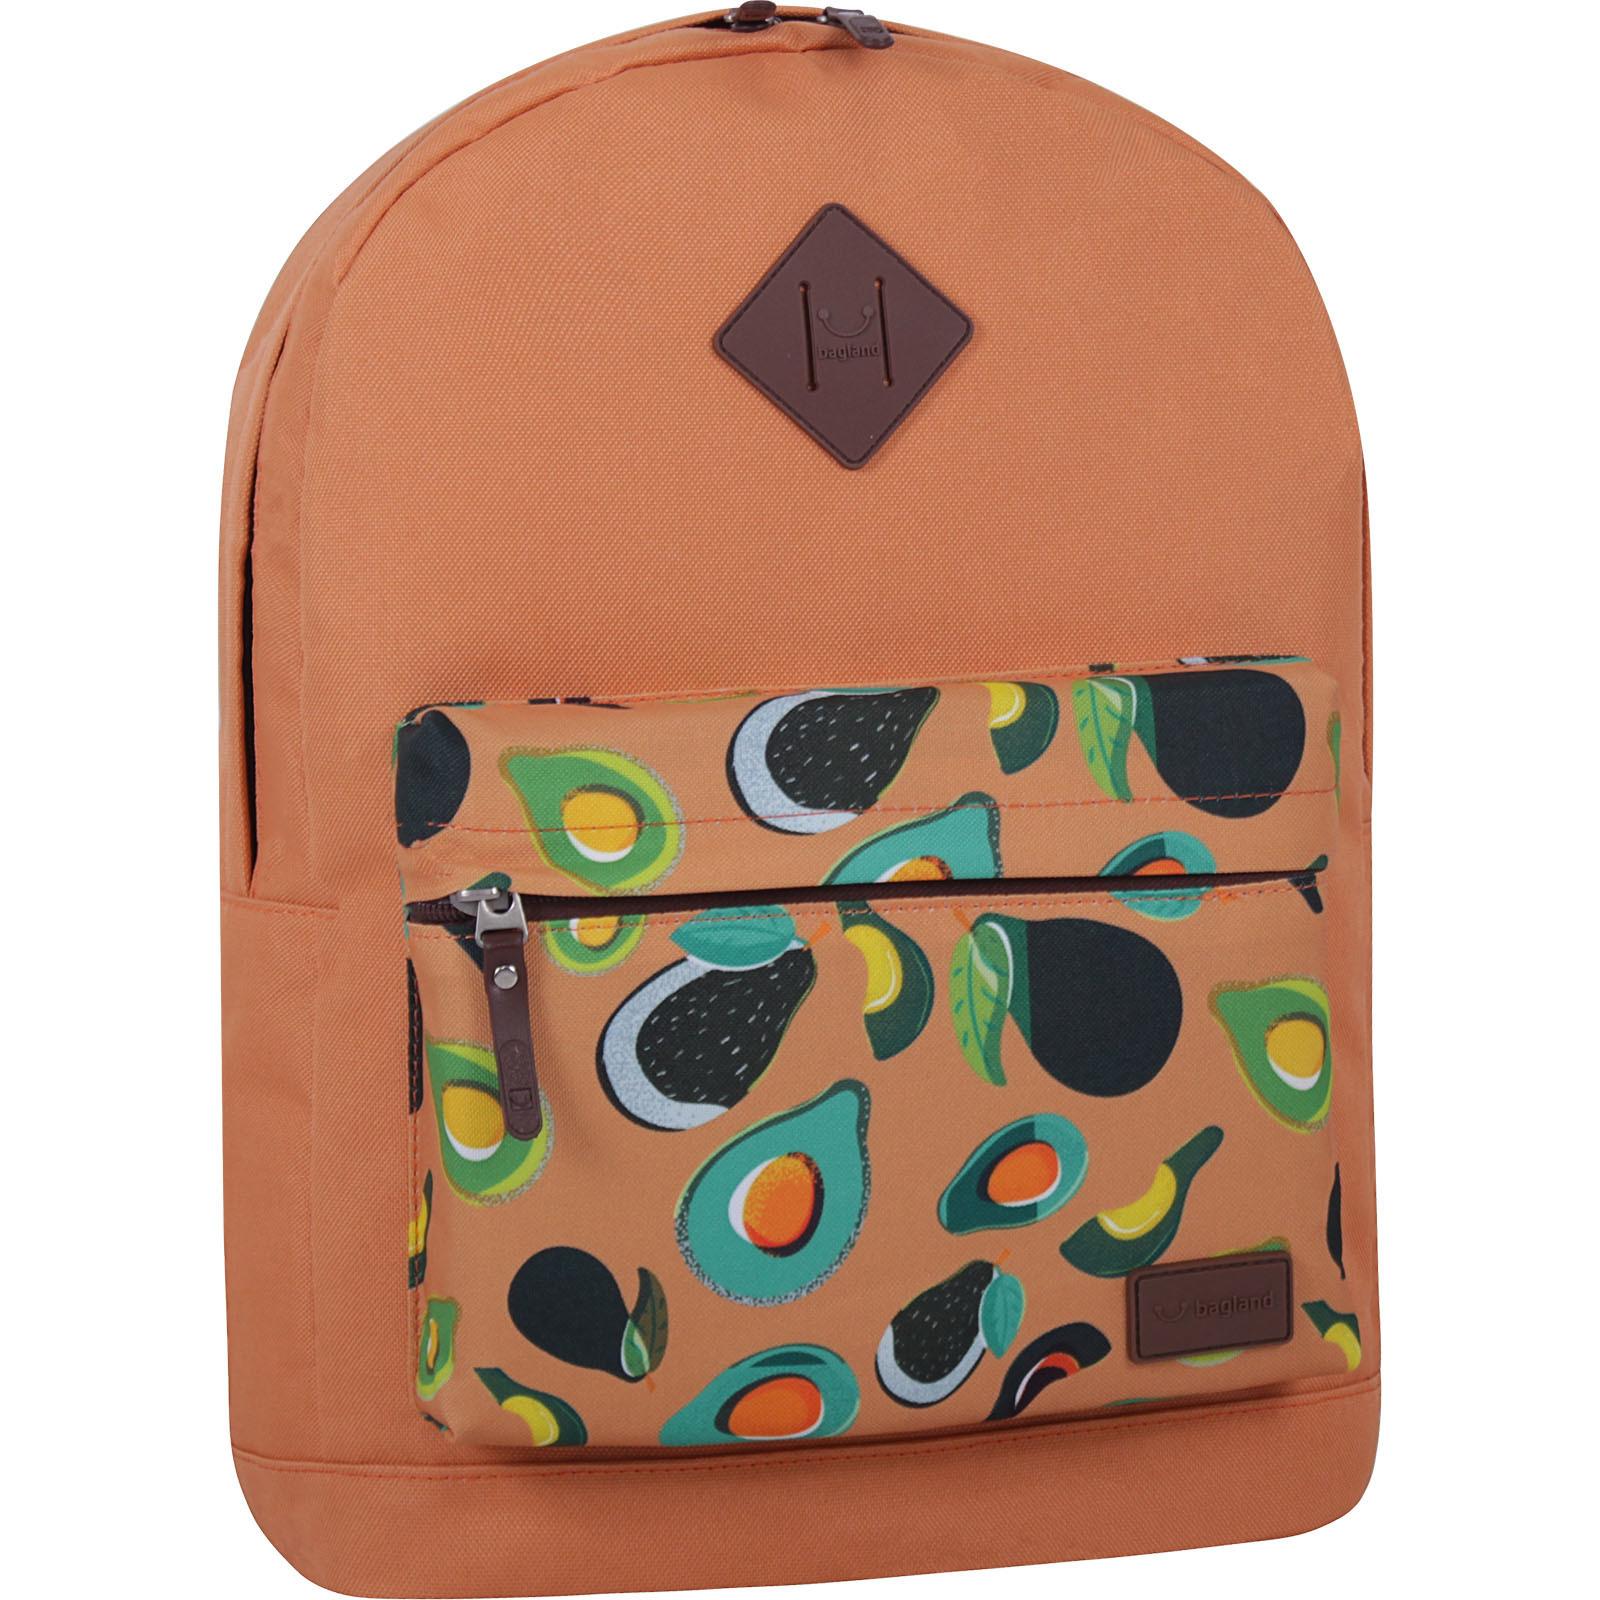 Молодежные рюкзаки Рюкзак Bagland Молодежный W/R 17 л. Рыжий 754 (00533662) IMG_7227_суб.754_-1600.jpg